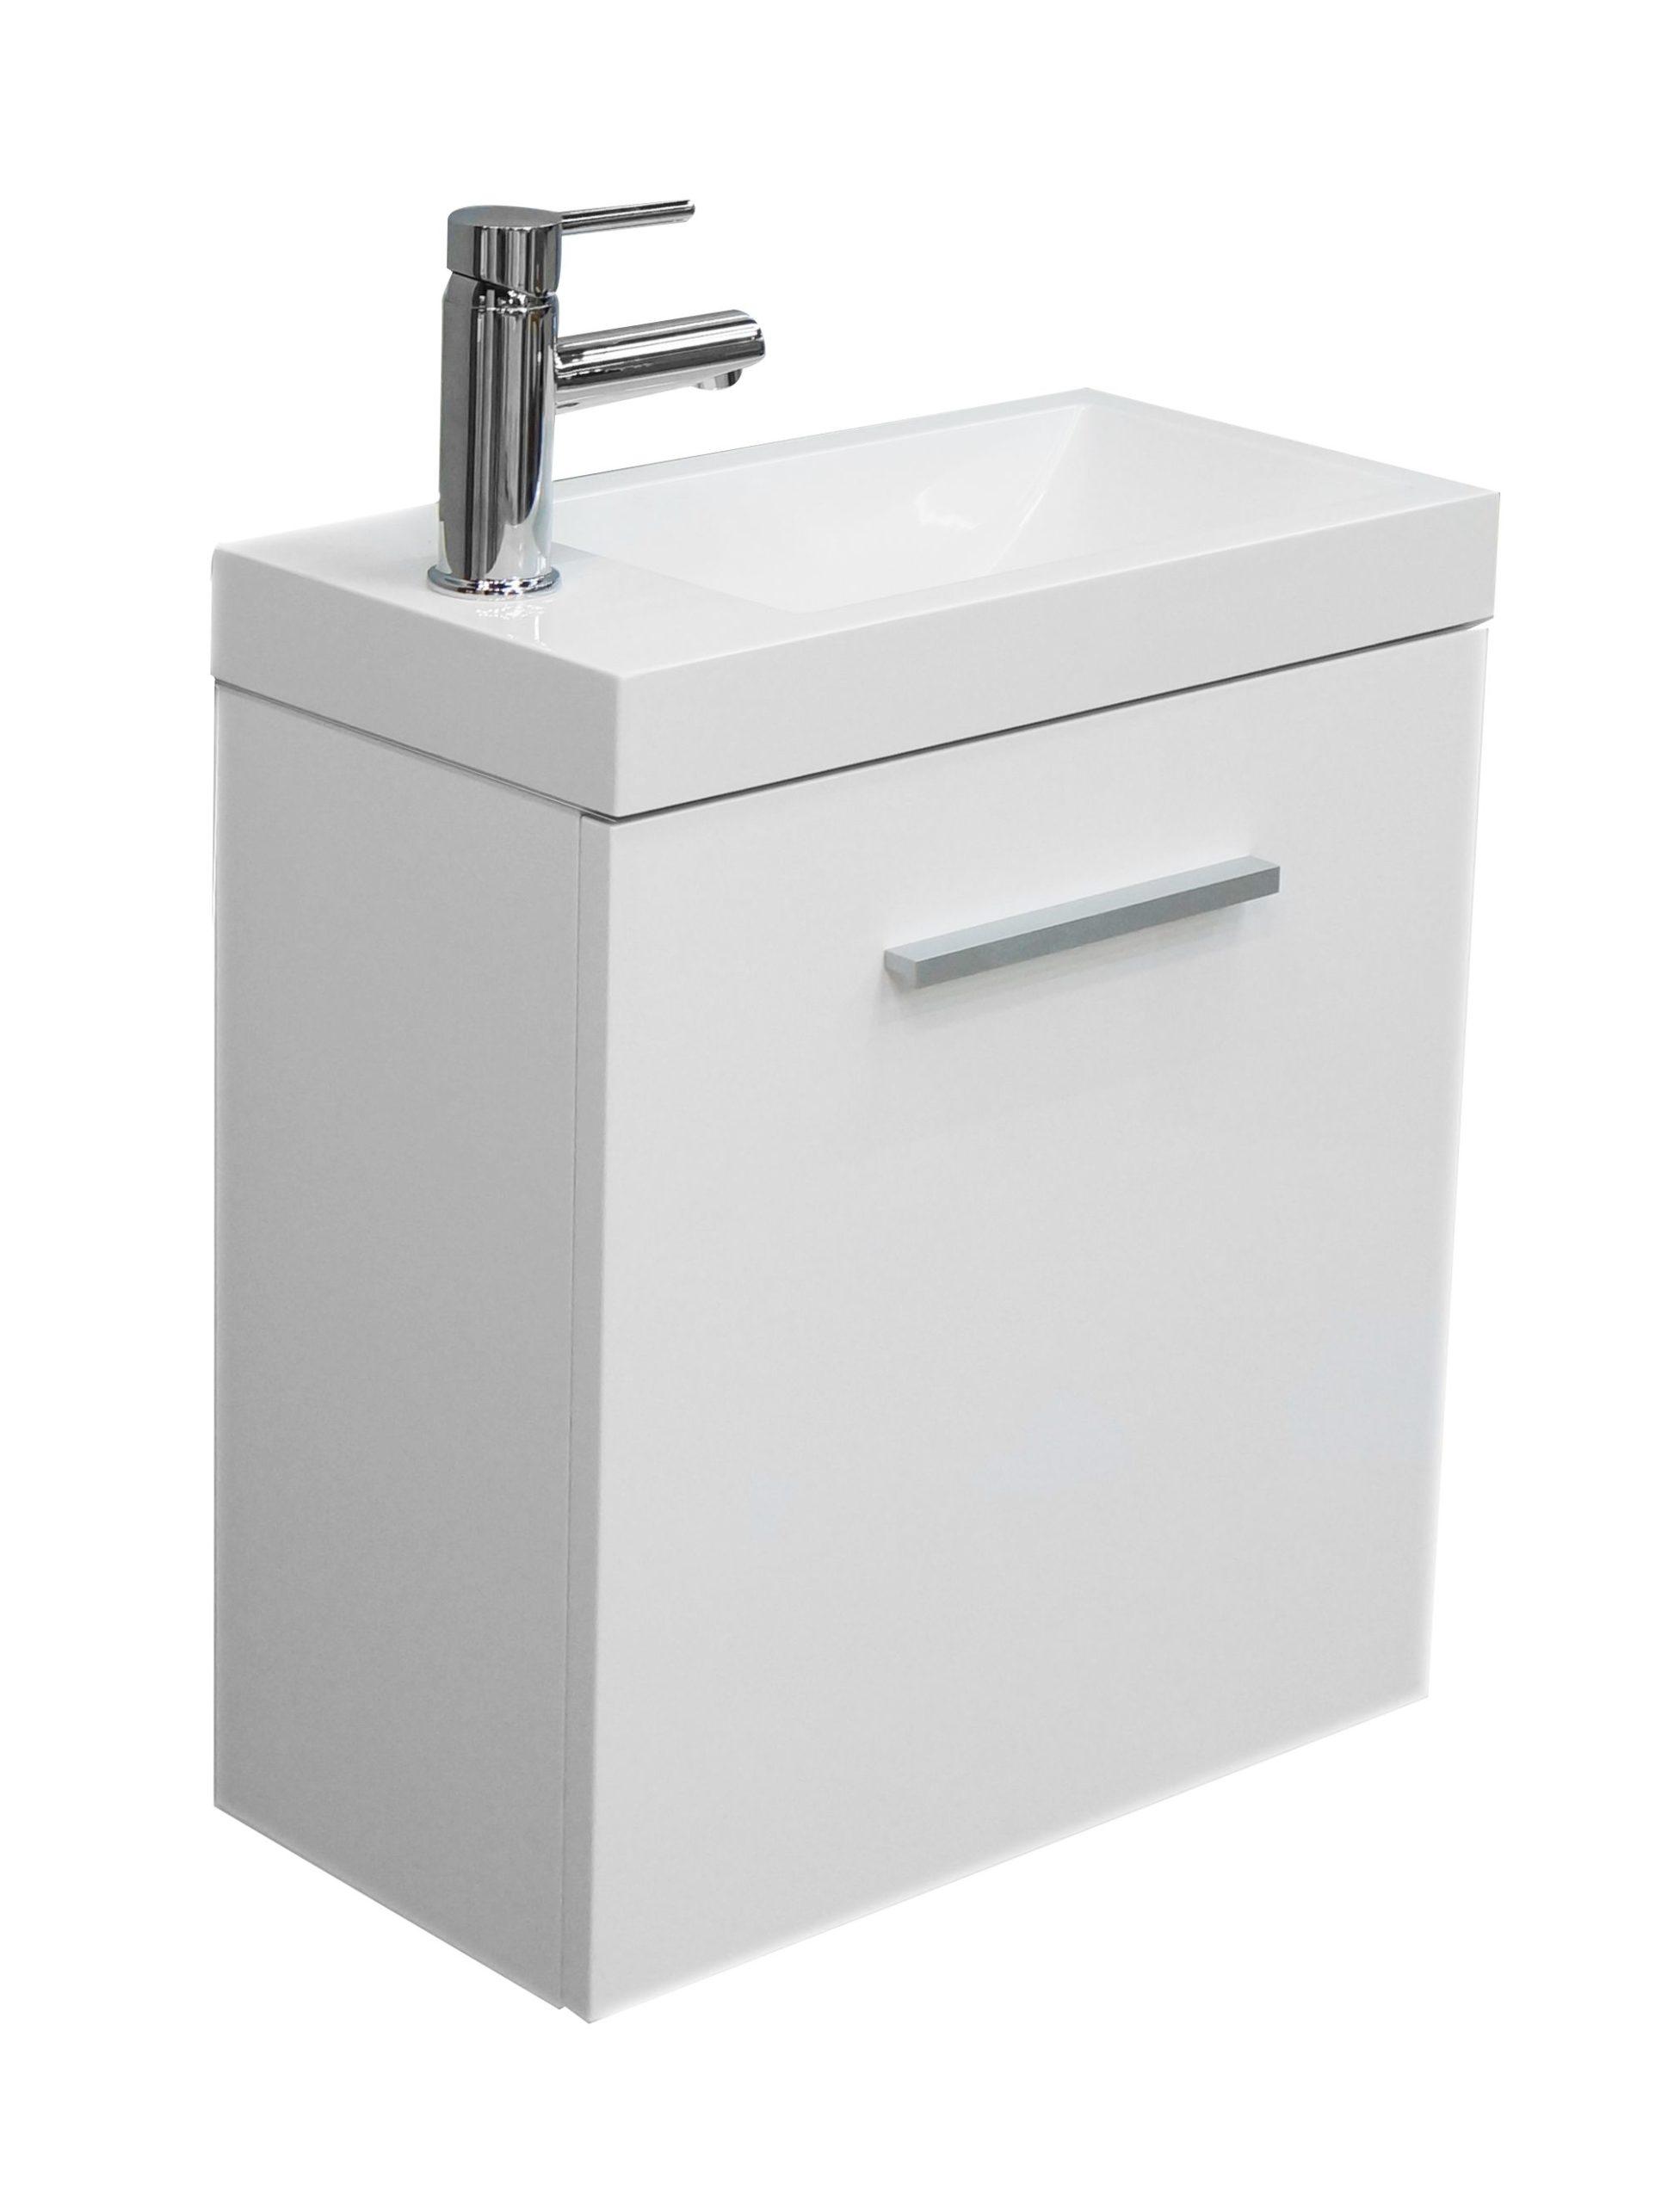 Mueller Emma toiletmeubel met kraan en sifon hoogglans wit 50x25x50cm